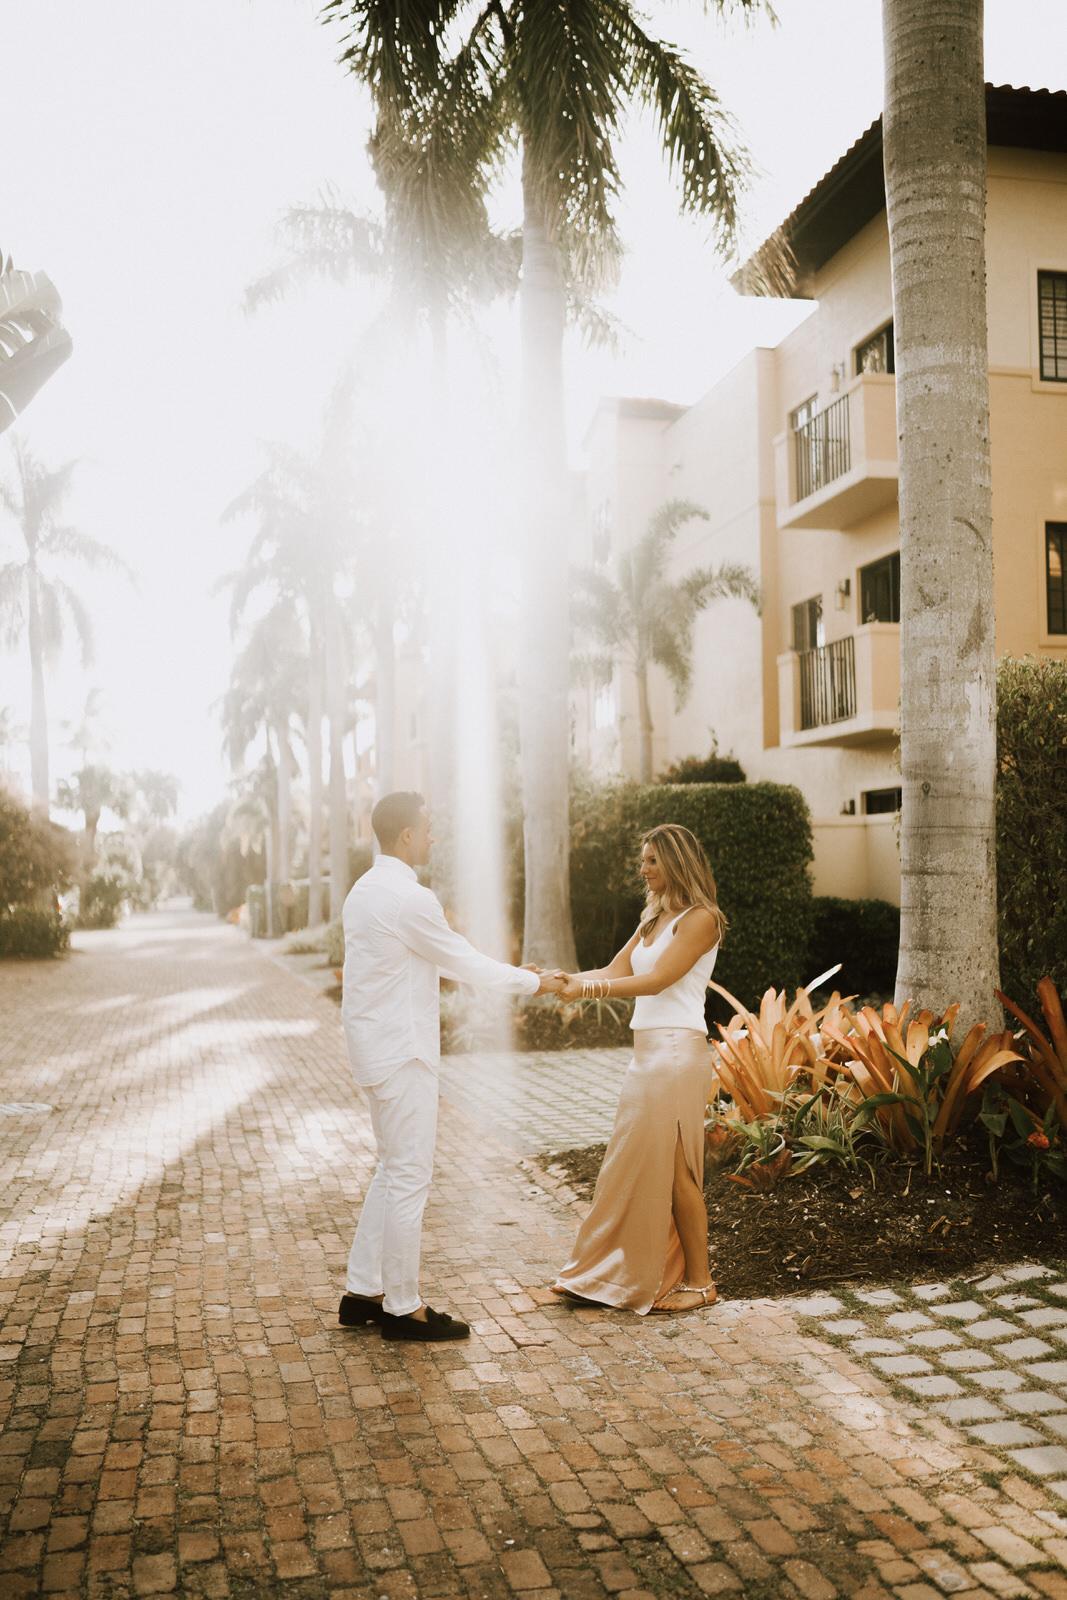 Naples 5th Ave Engagement Photos- Michelle Gonzalez Photography- Michele + Troy-35.JPG